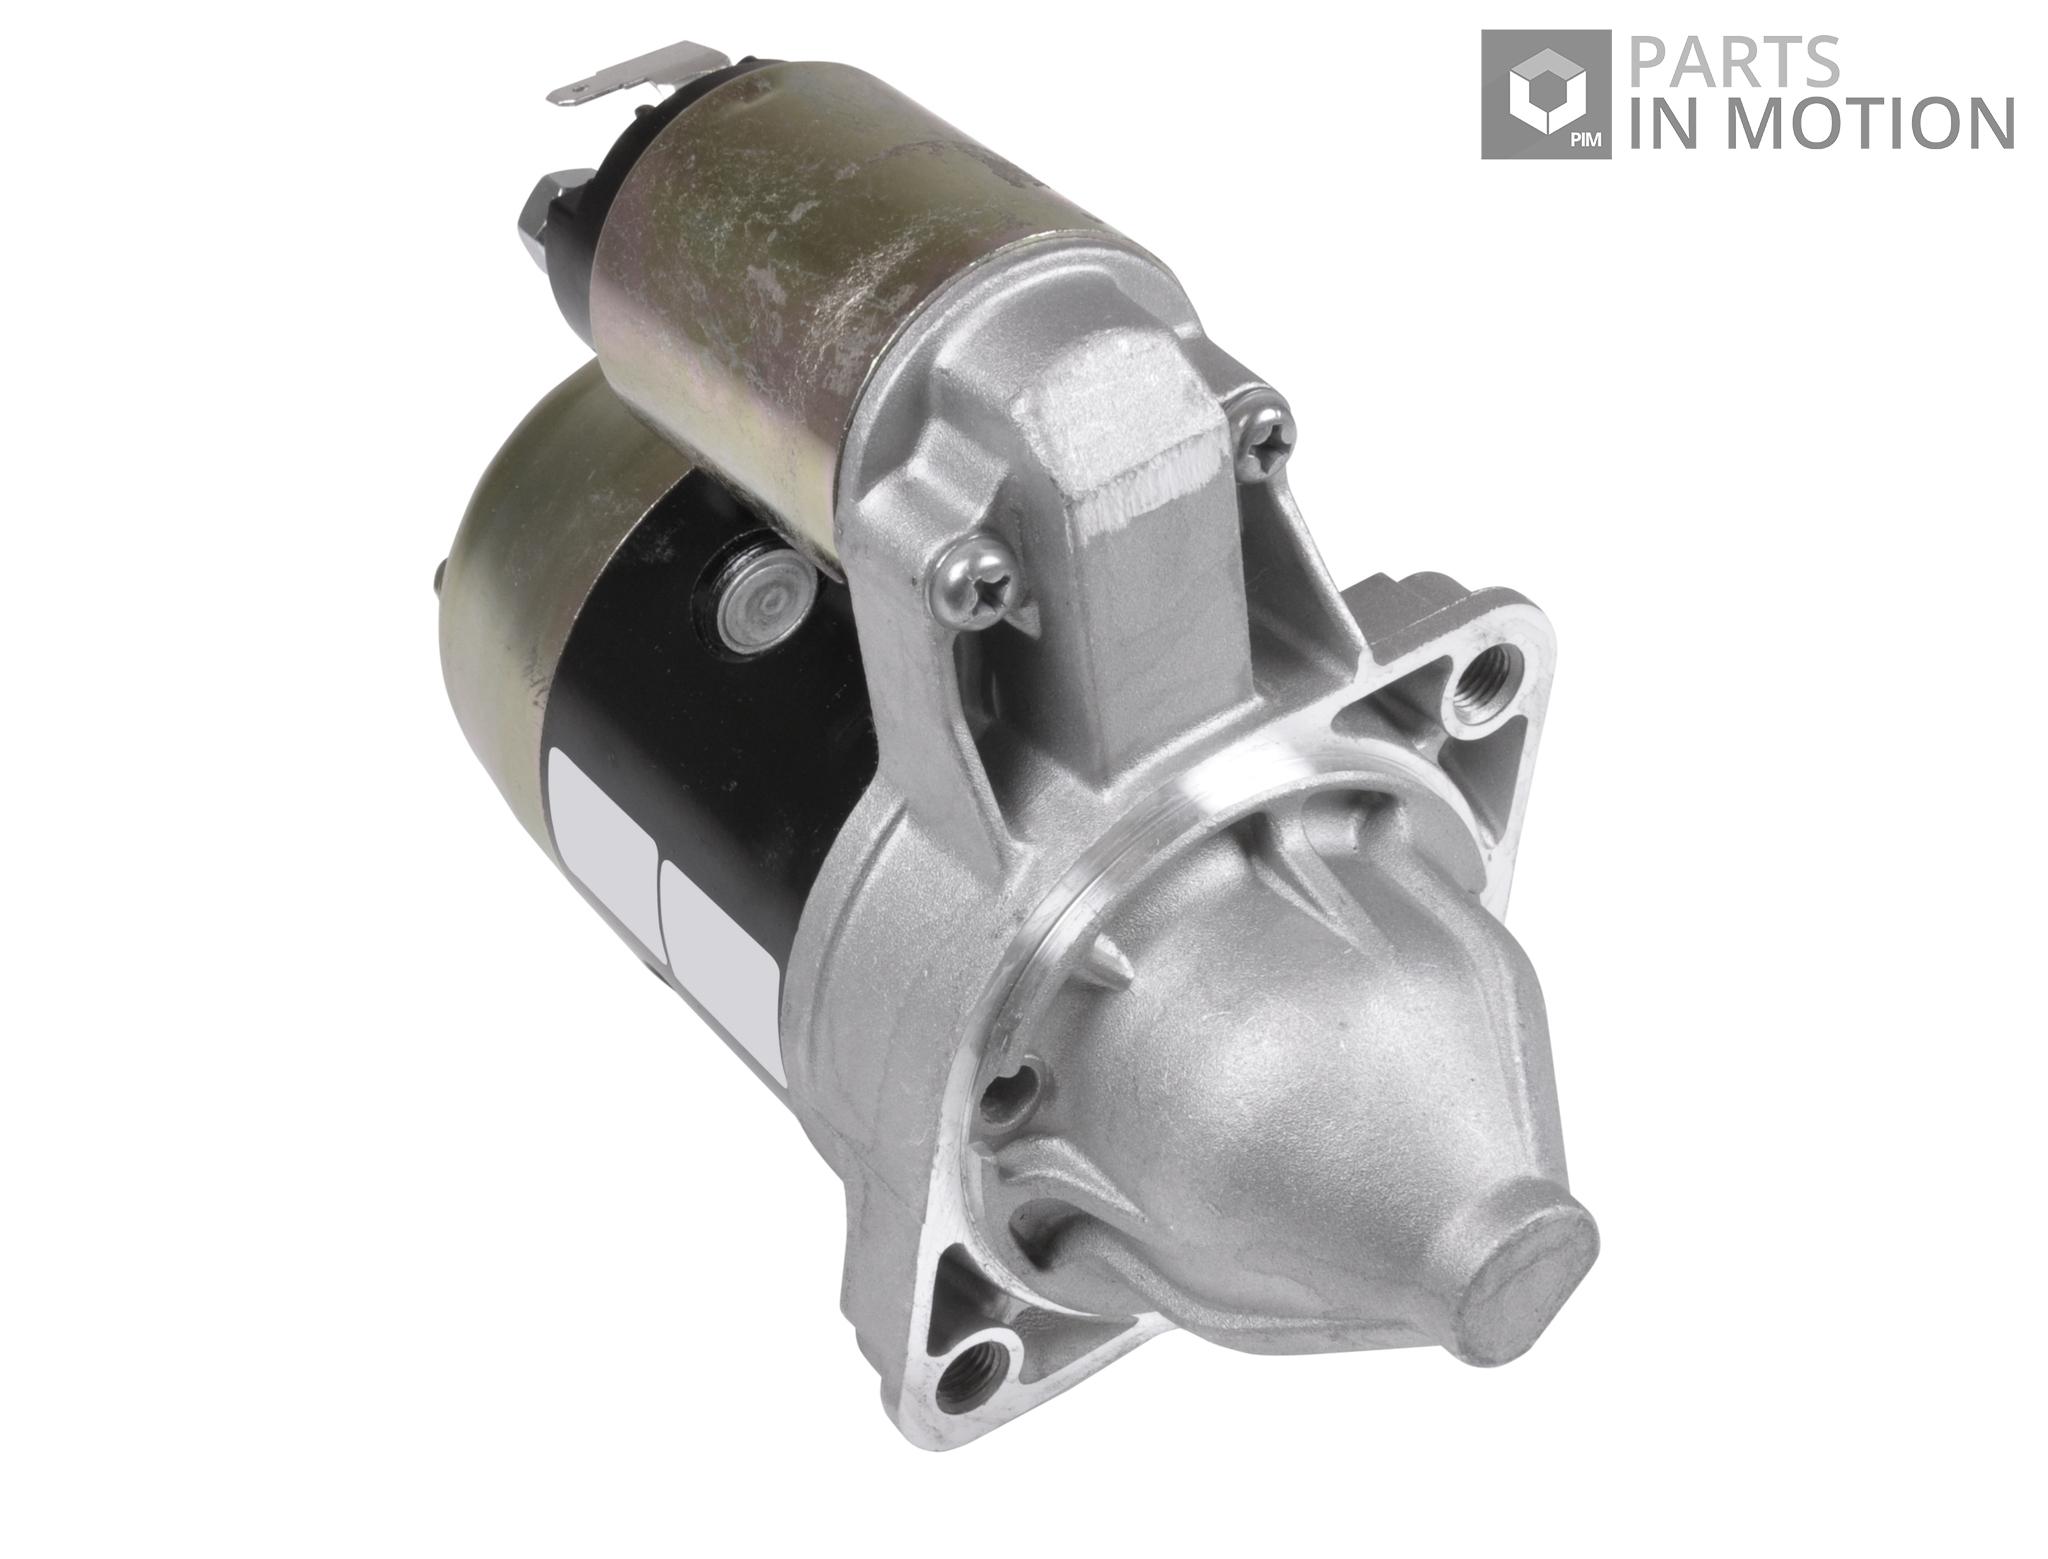 Starter motor fits kia rio mk2 16 2005 on g4ed manual adl blue print starter motor adg01248c malvernweather Choice Image